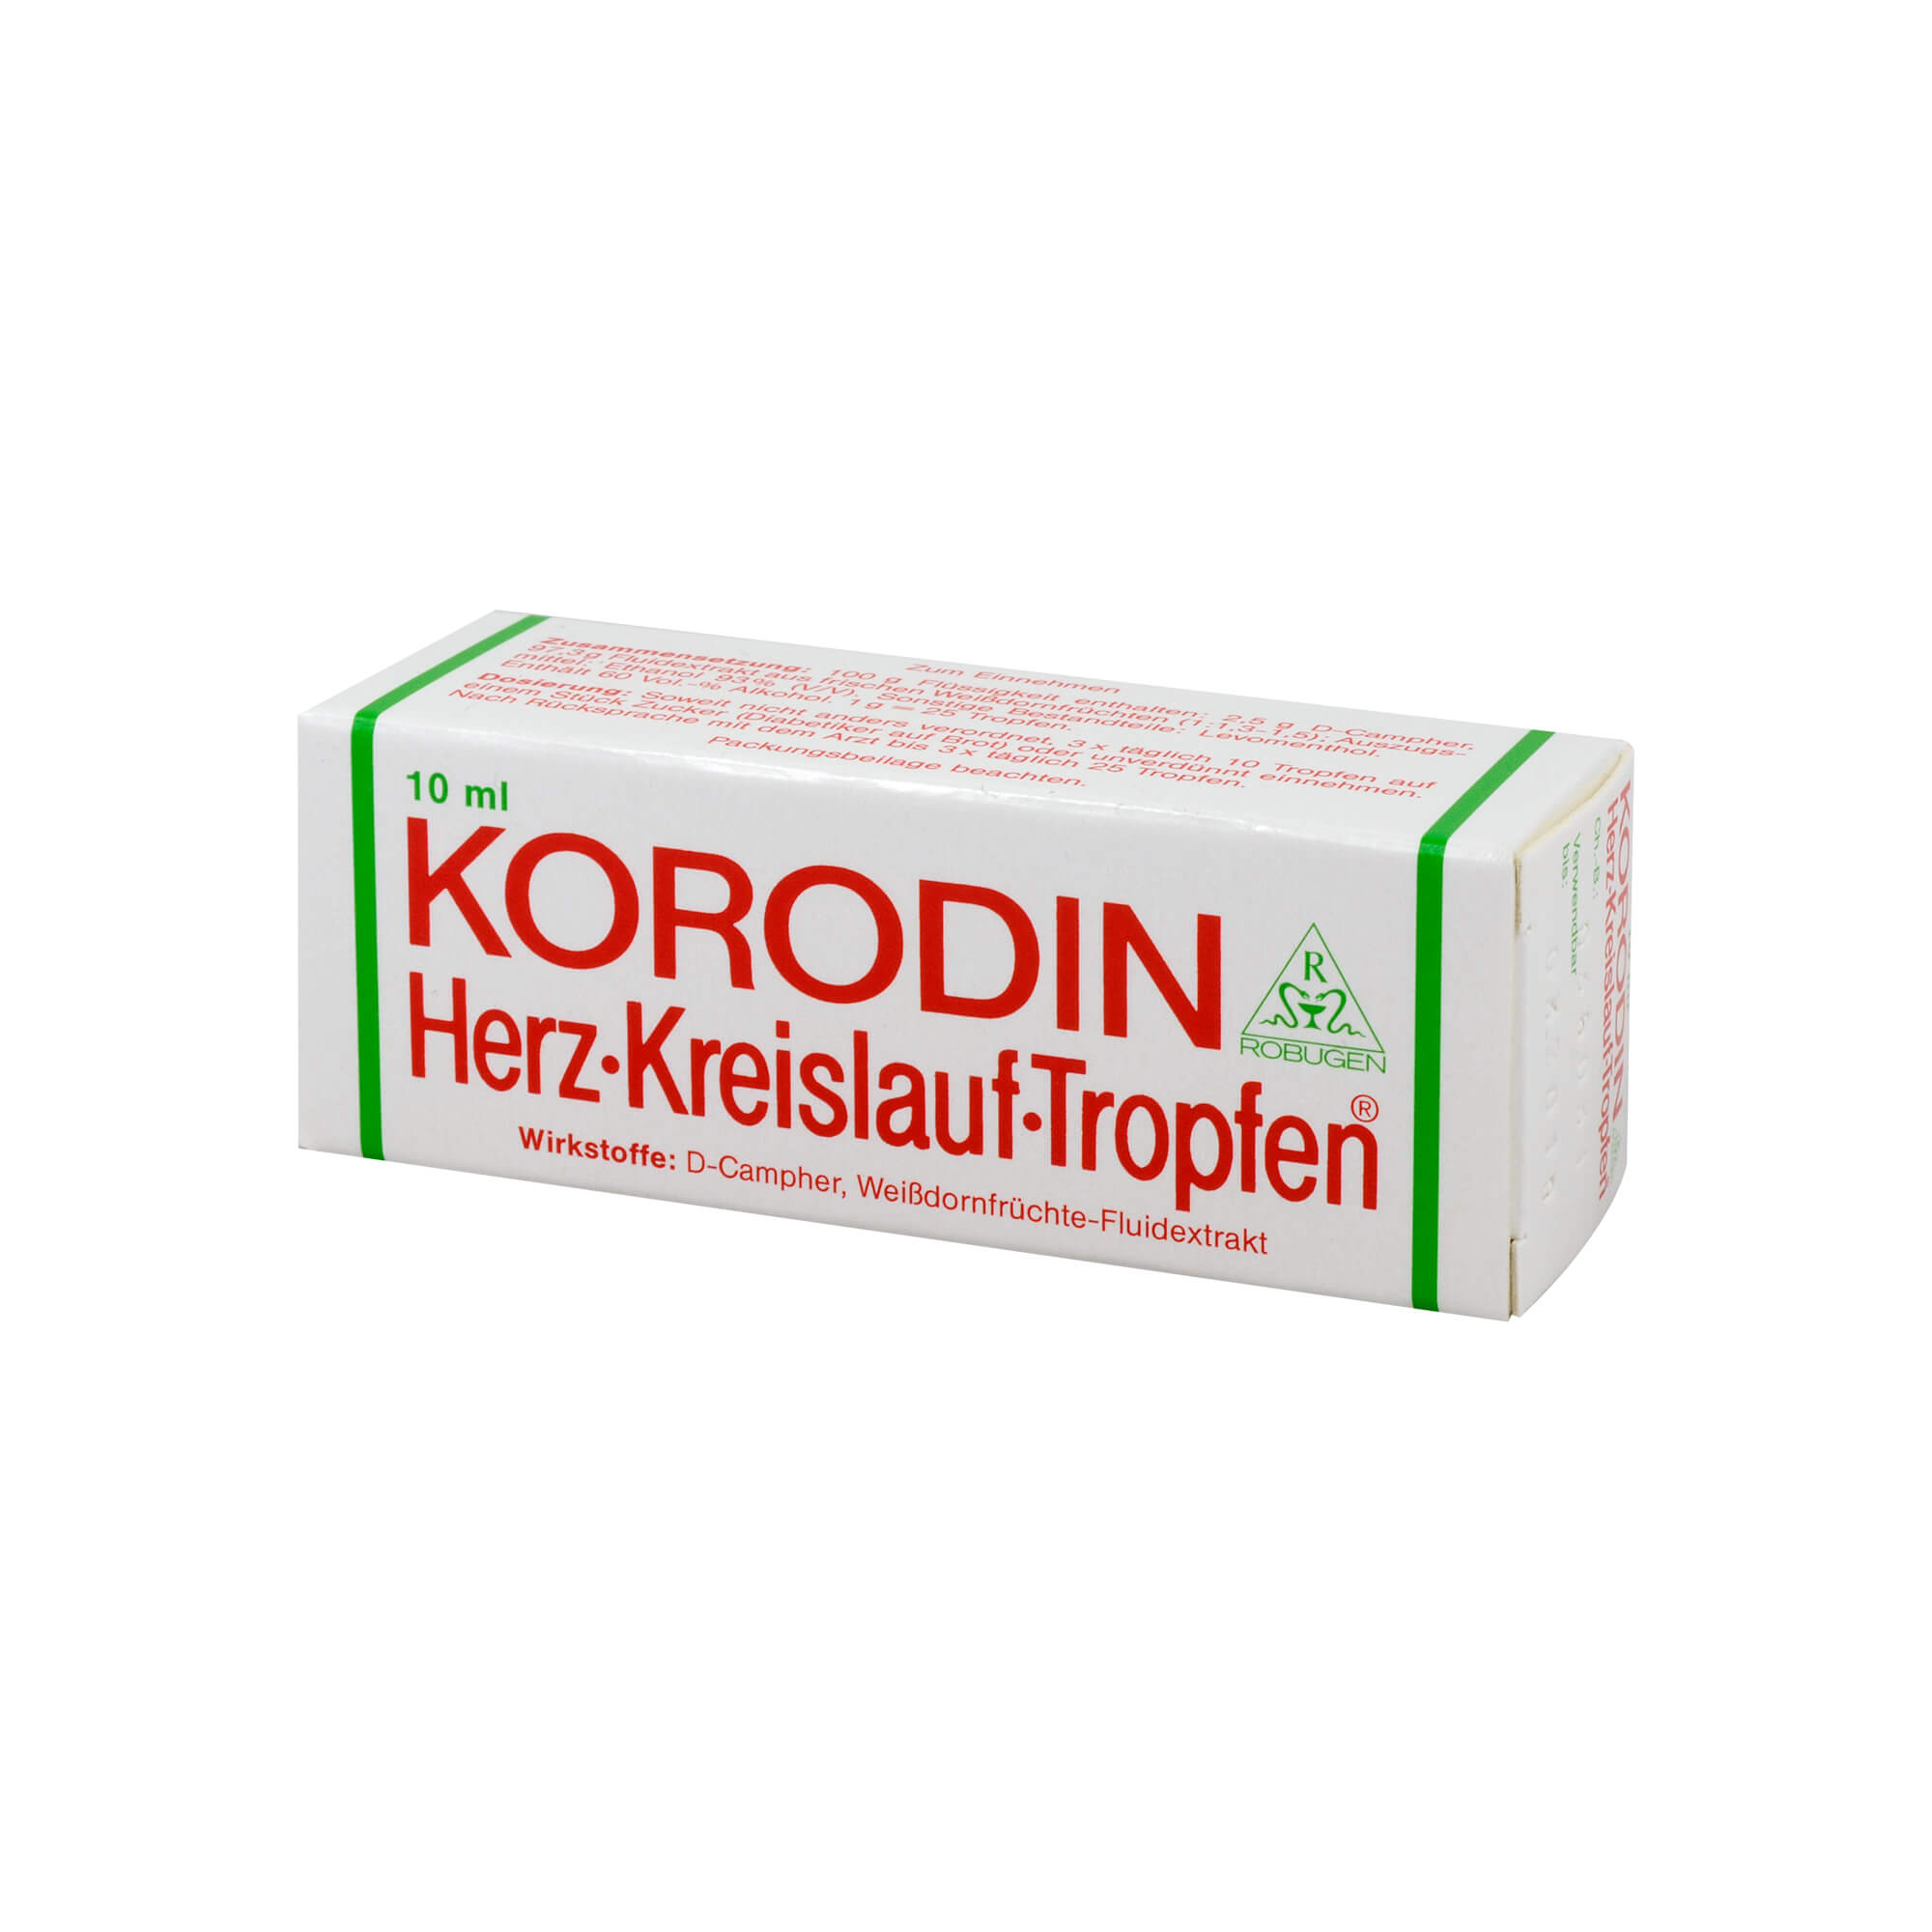 Korodin Herz-Kreislauf-Tropfen